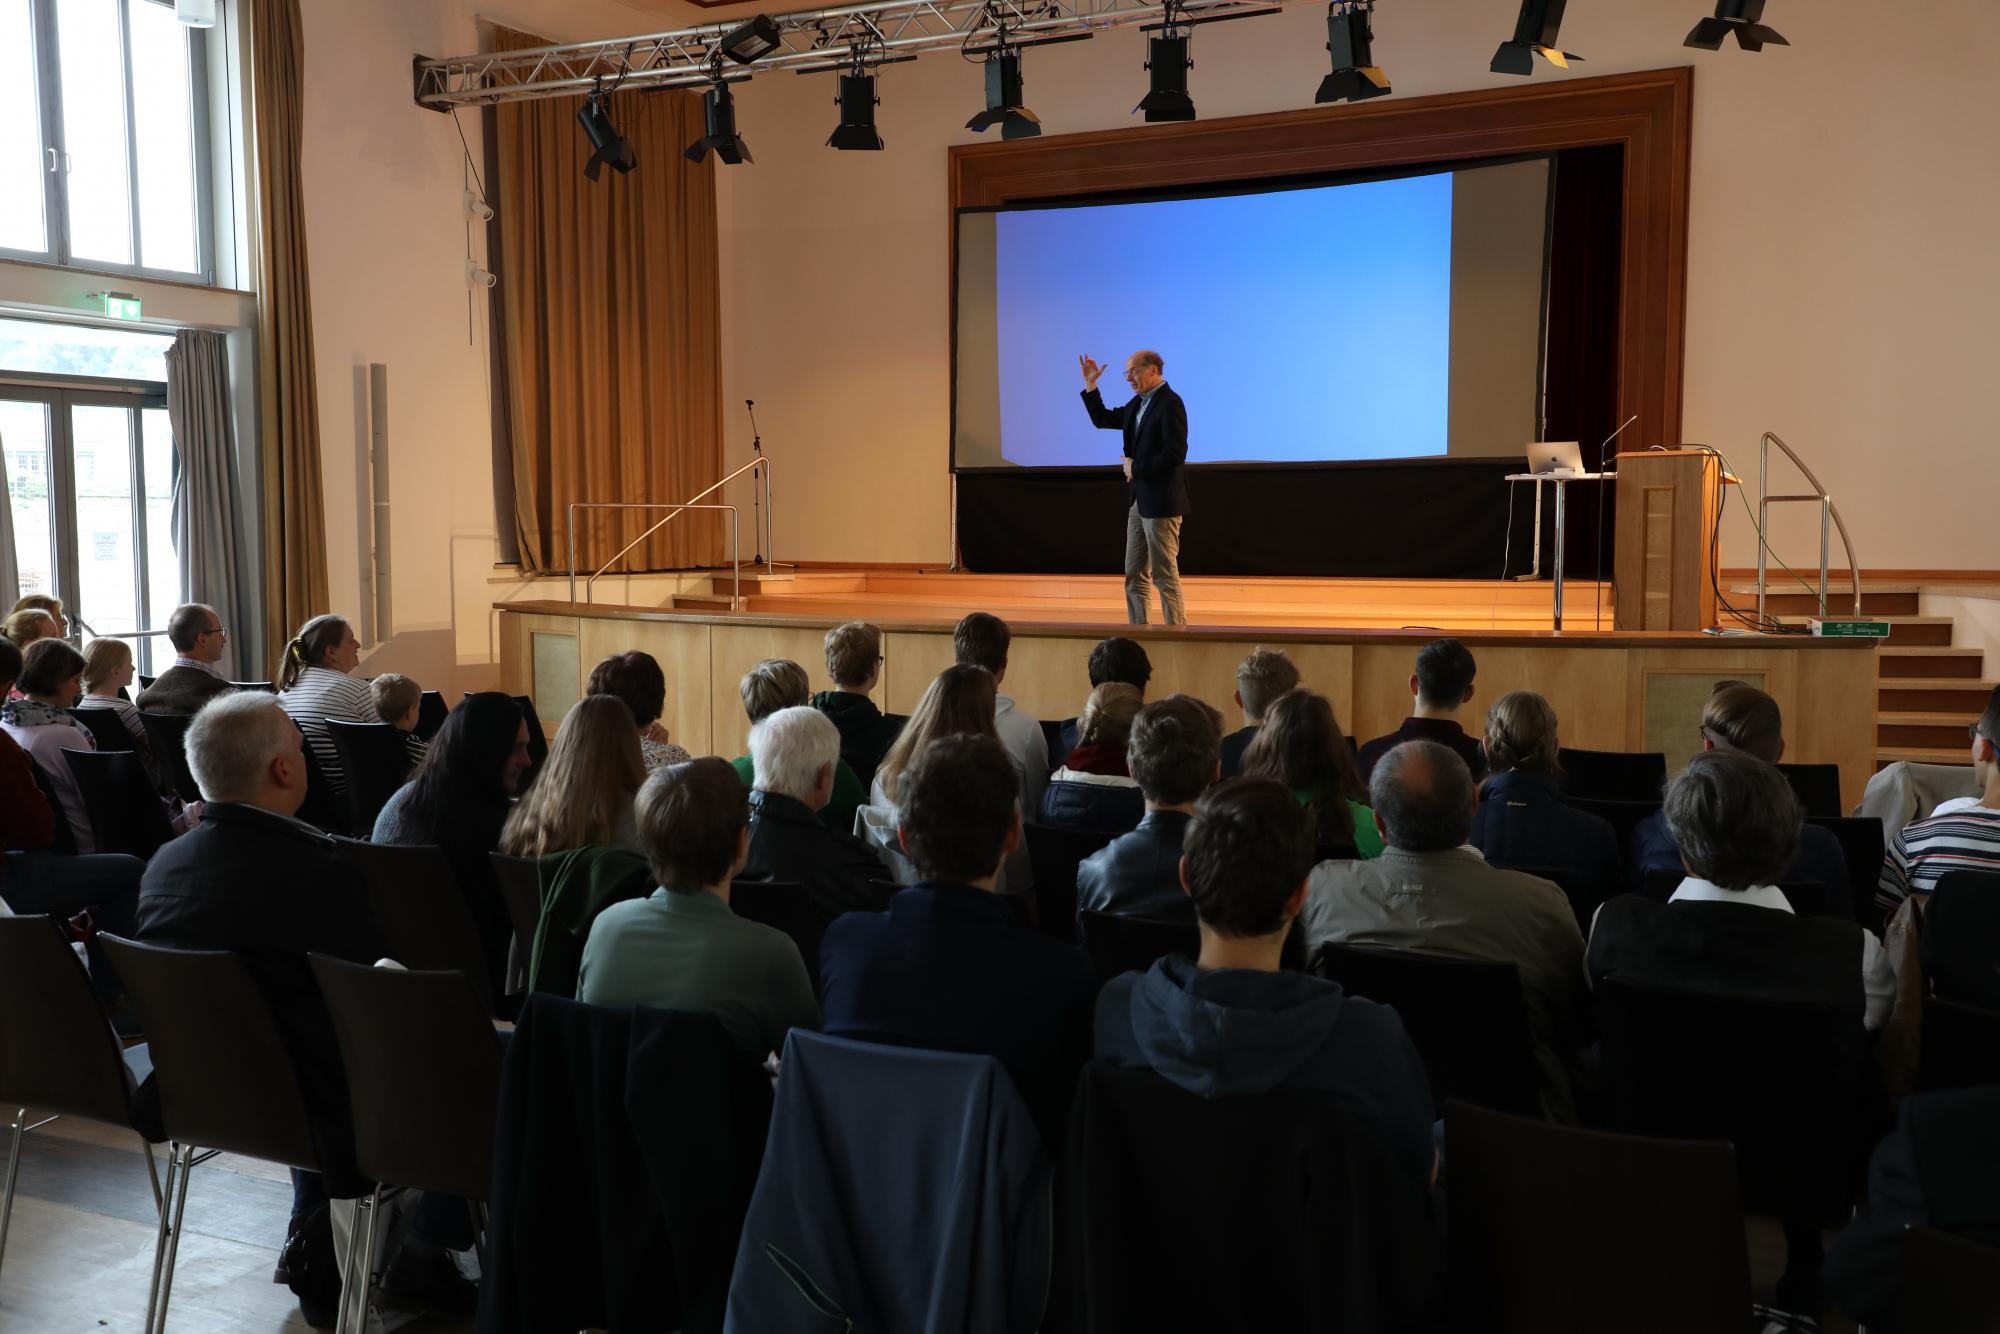 2019_news_Kirchenmusik429A6343